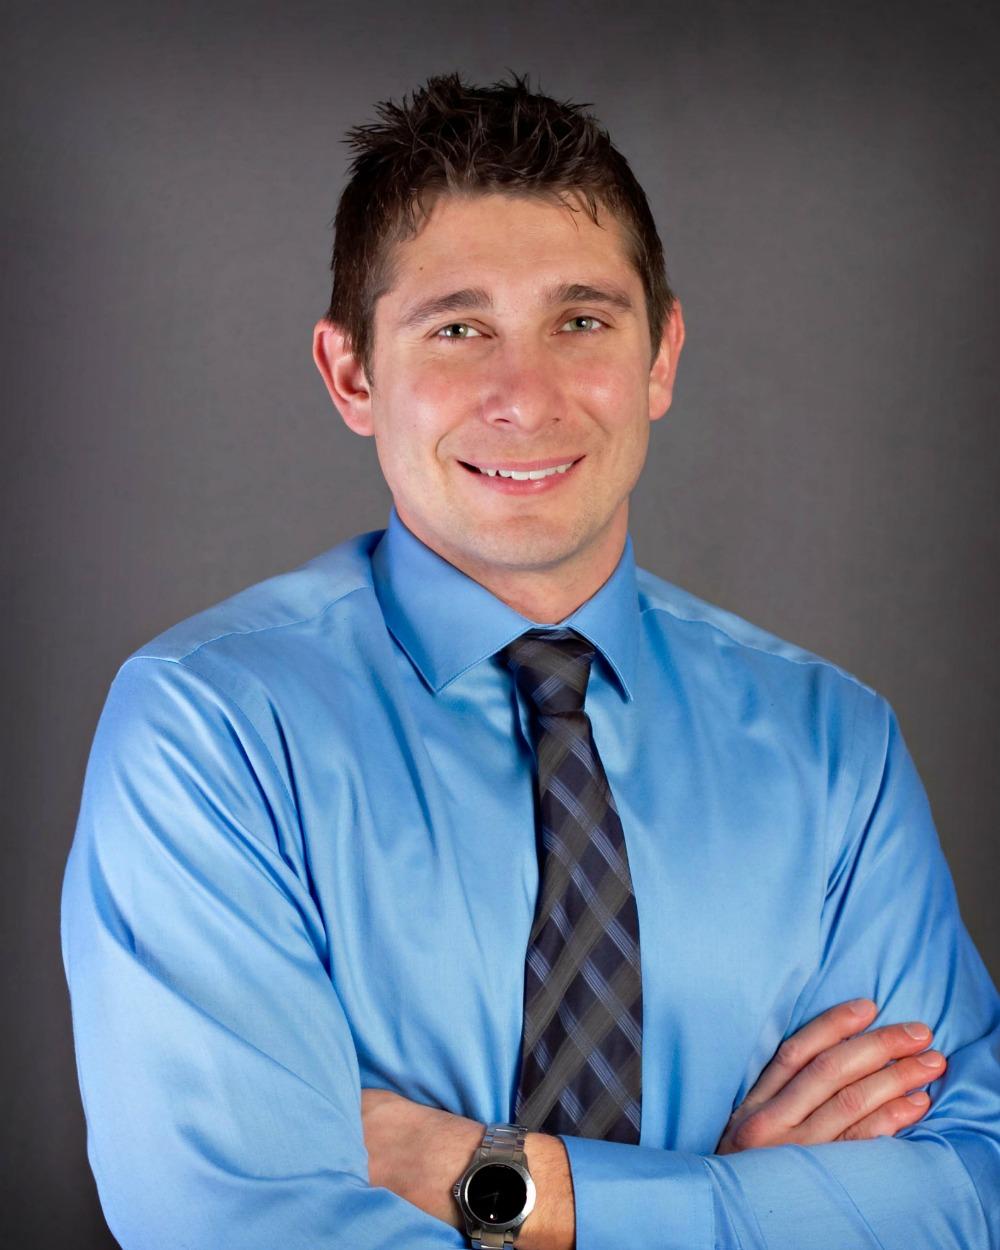 Brett Speer - Chiropractor